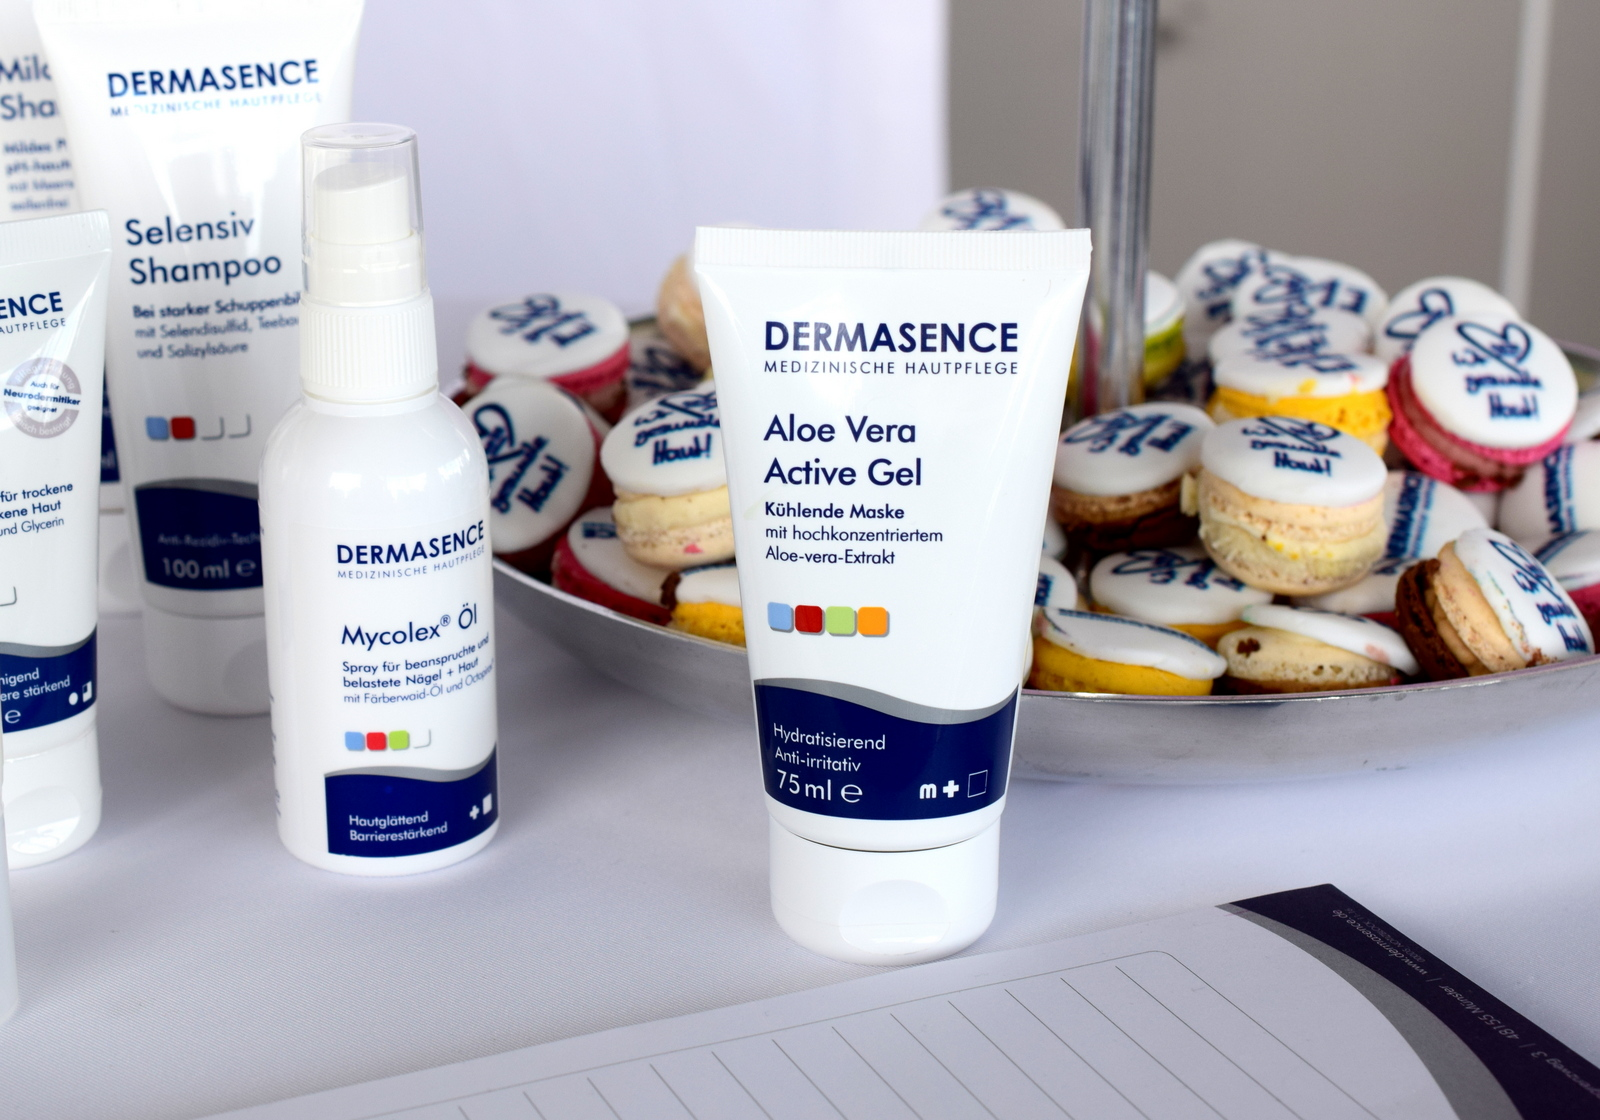 Apotheken Kosmetik Dermasence beim Beautypress Blogger Event im Juli 2016 in Köln im Köln Sky